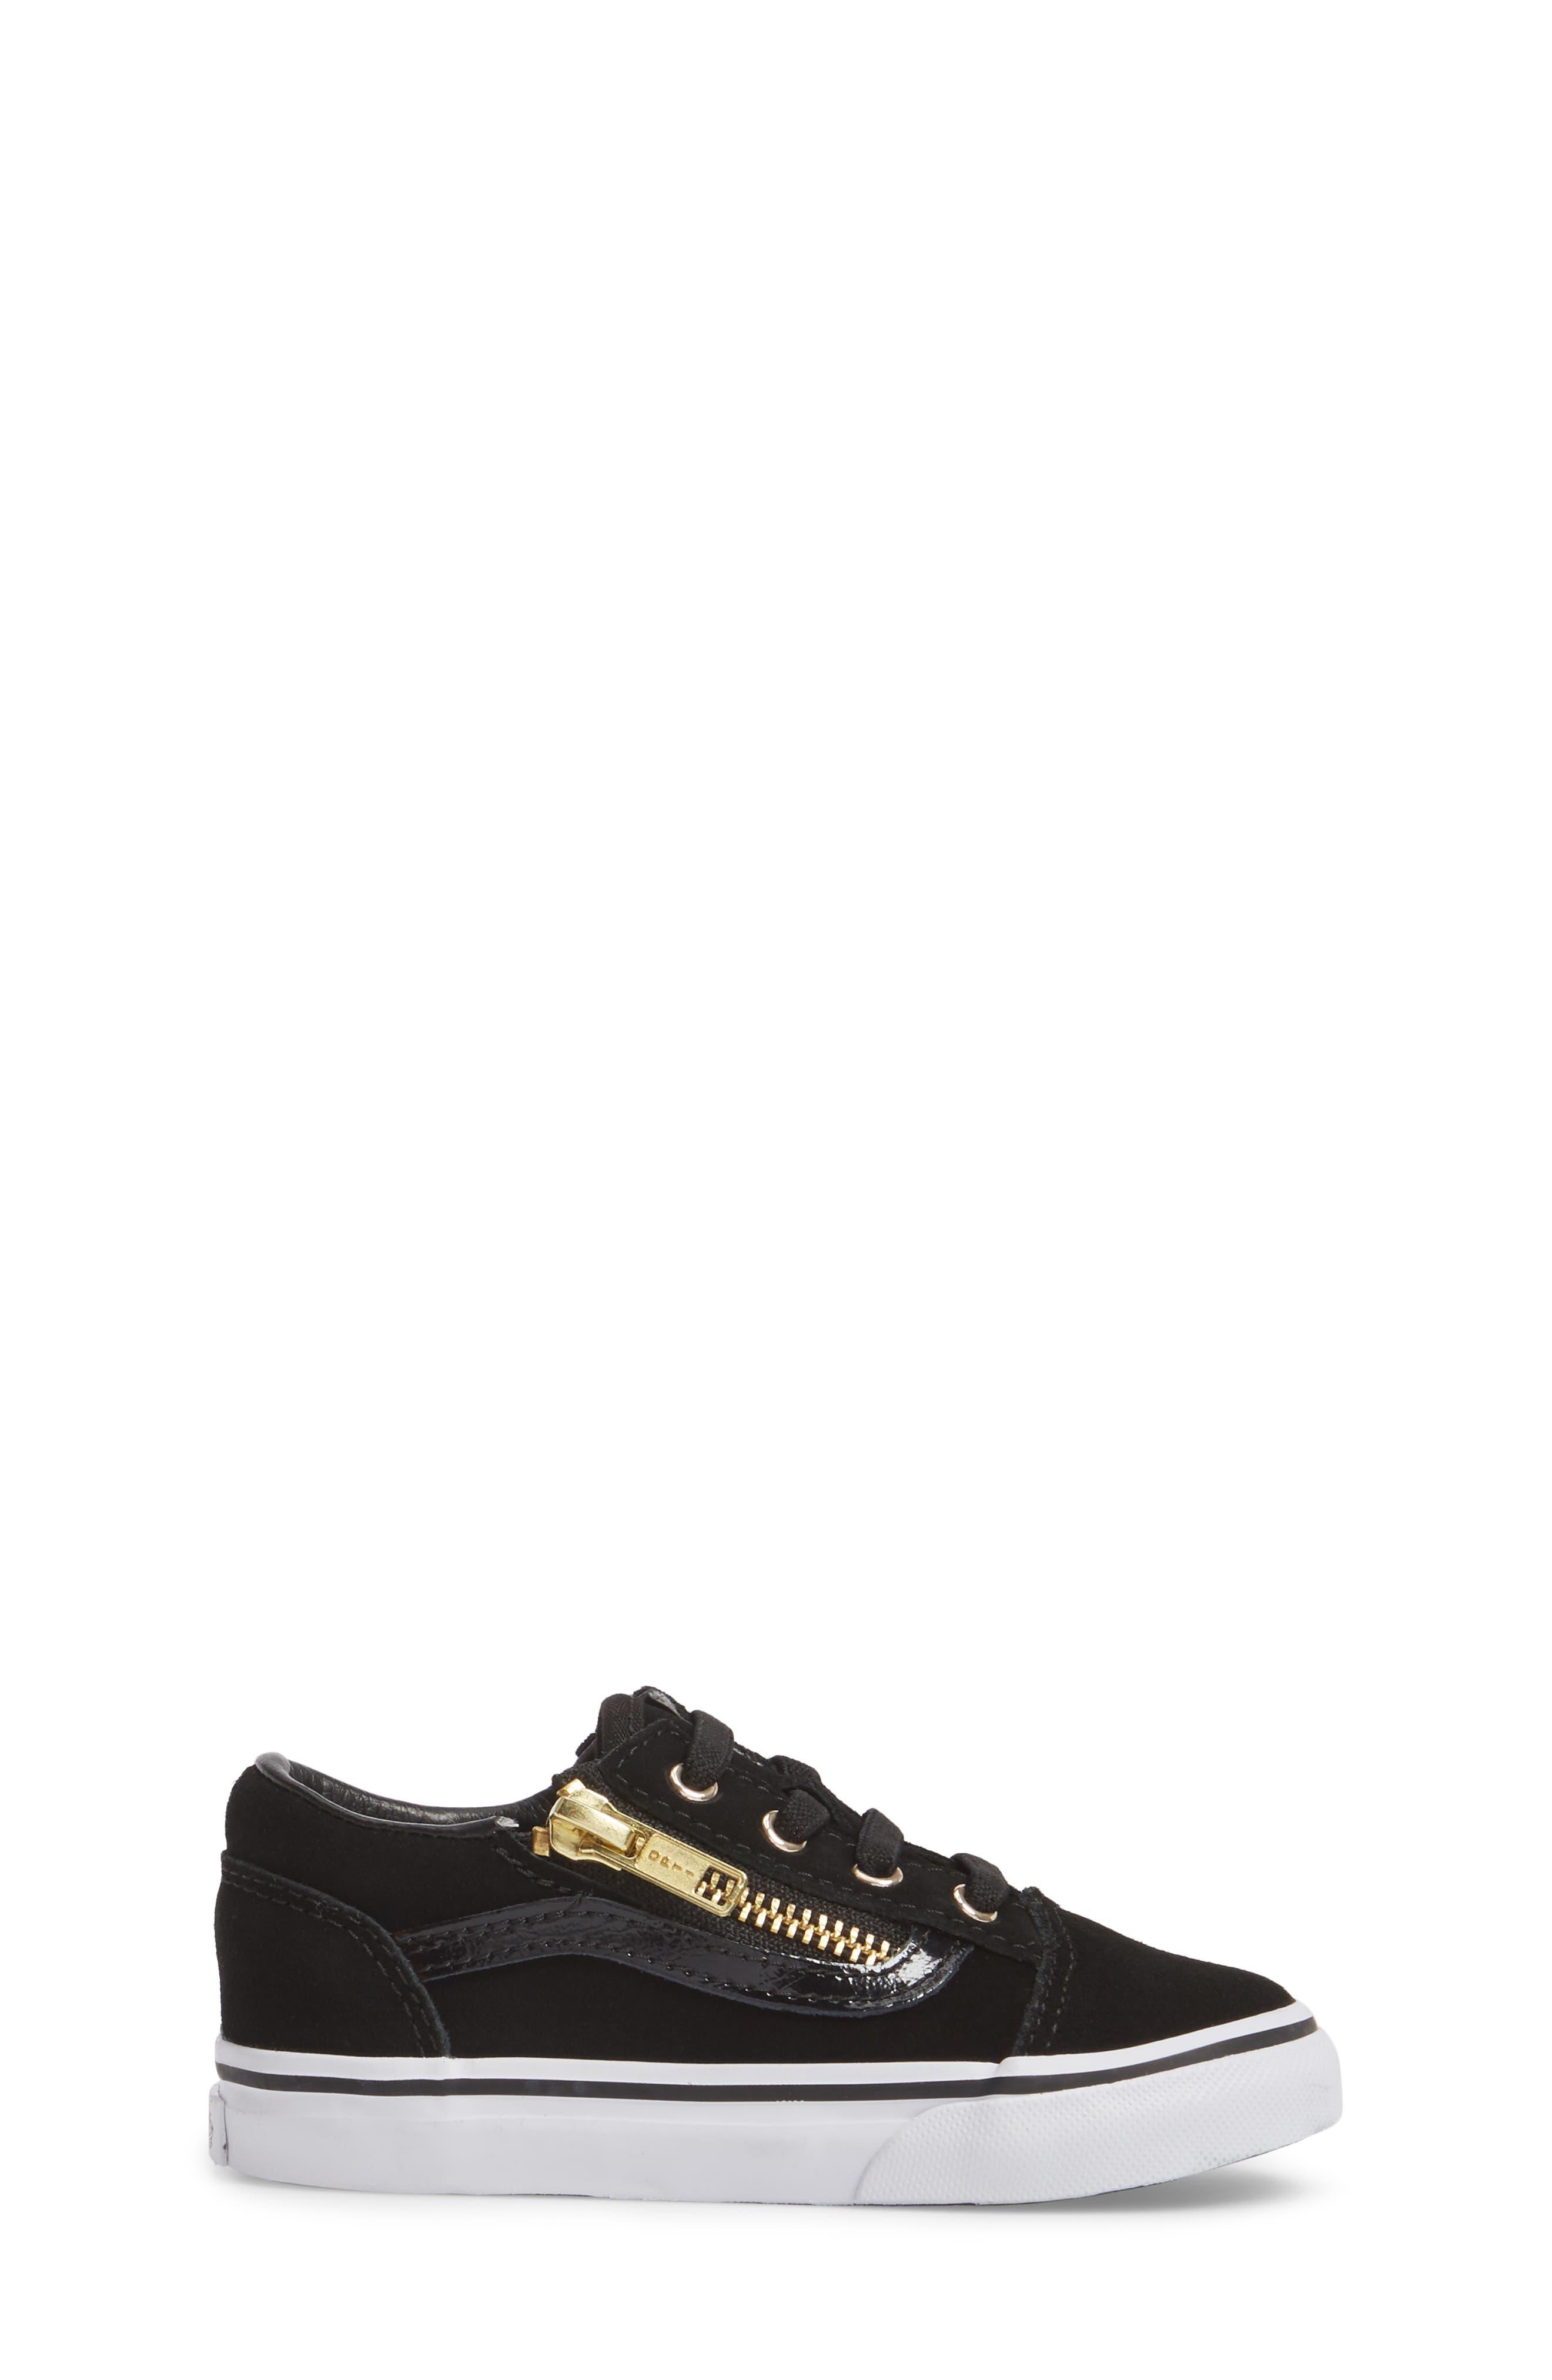 Old Skool Zip Sneaker,                             Alternate thumbnail 3, color,                             Black/ Gold